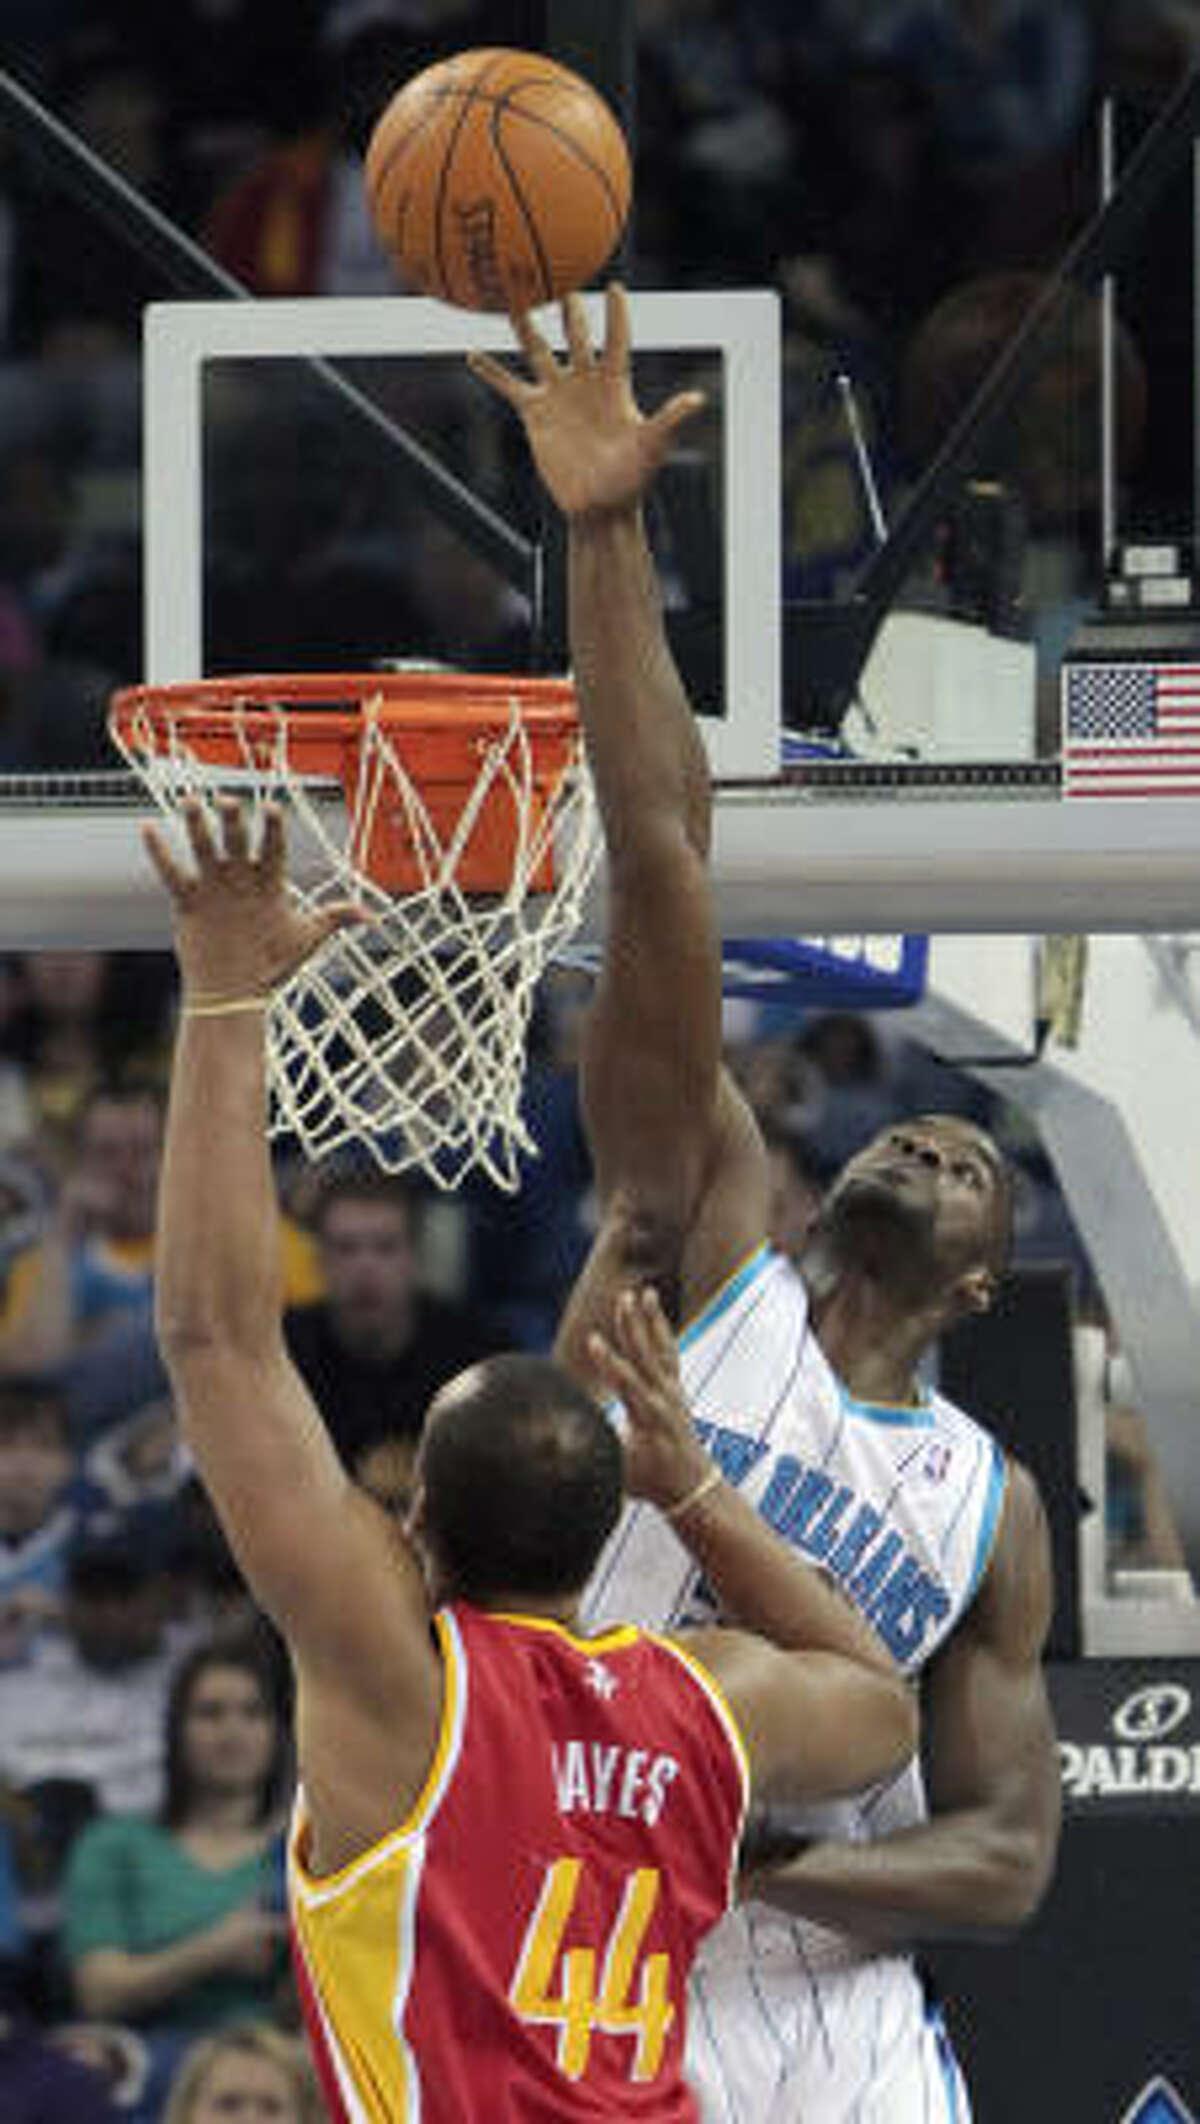 New Orleans Hornets center Emeka Okafor, right, blocks the shot of Rockets center Chuck Hayes.